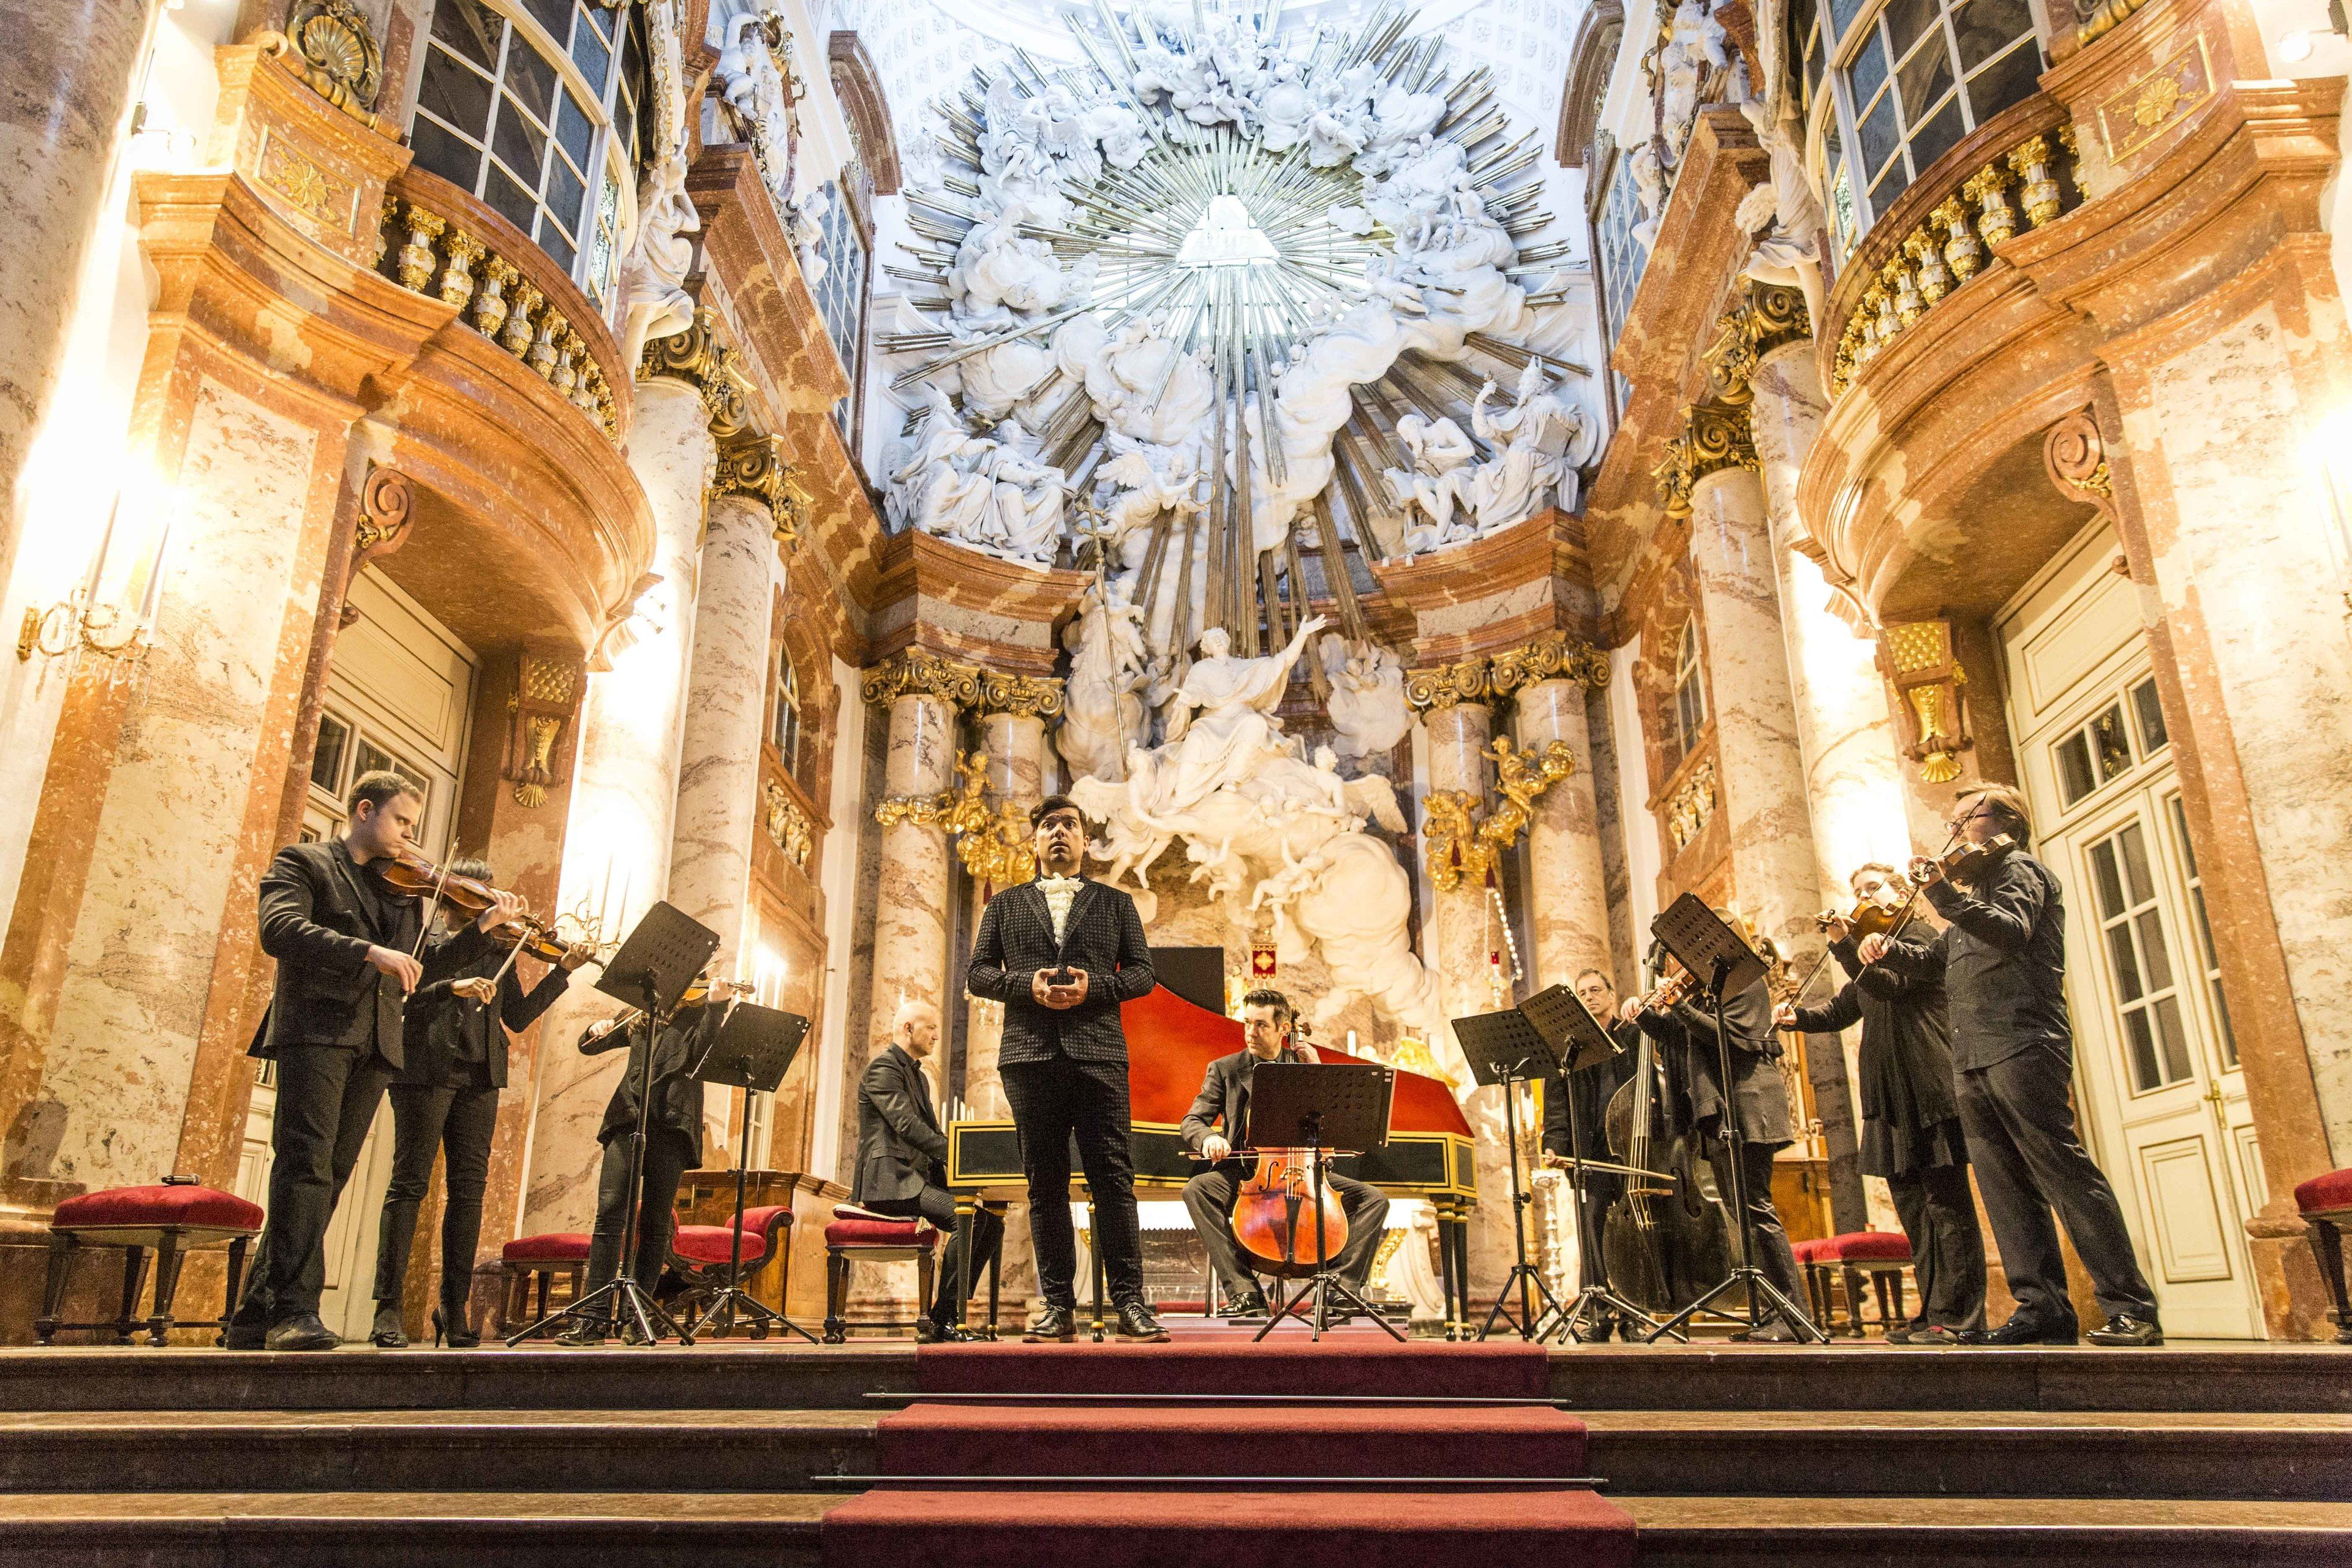 Vivaldi's The Four Seasons Concert at St. Charles's Church